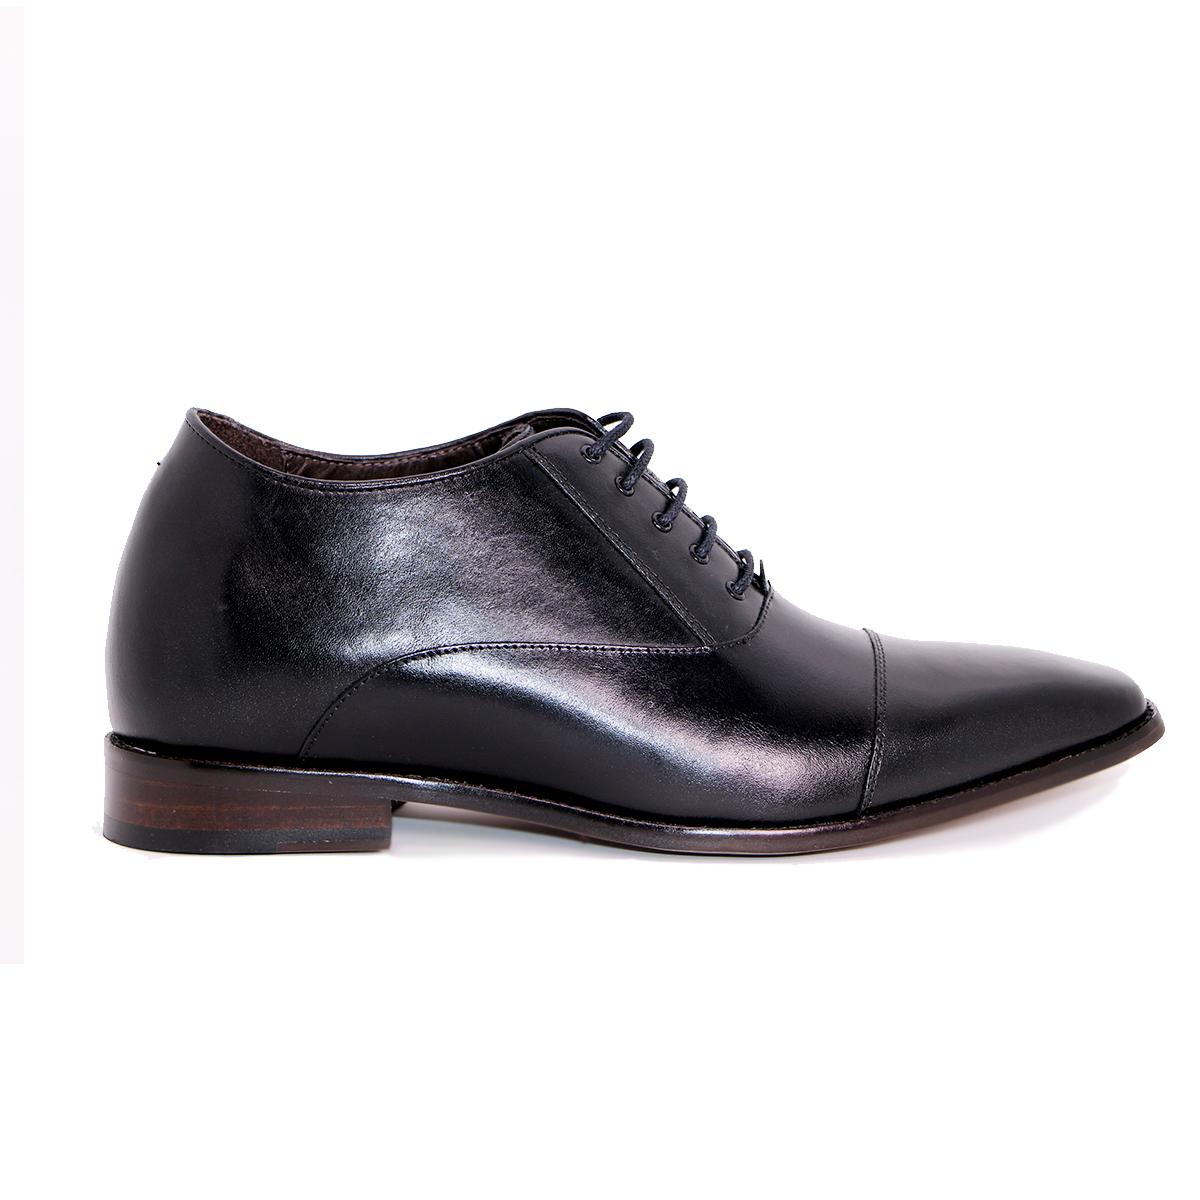 Zapato Formal Director Negro Max Denegri +7cms De Altura_72711